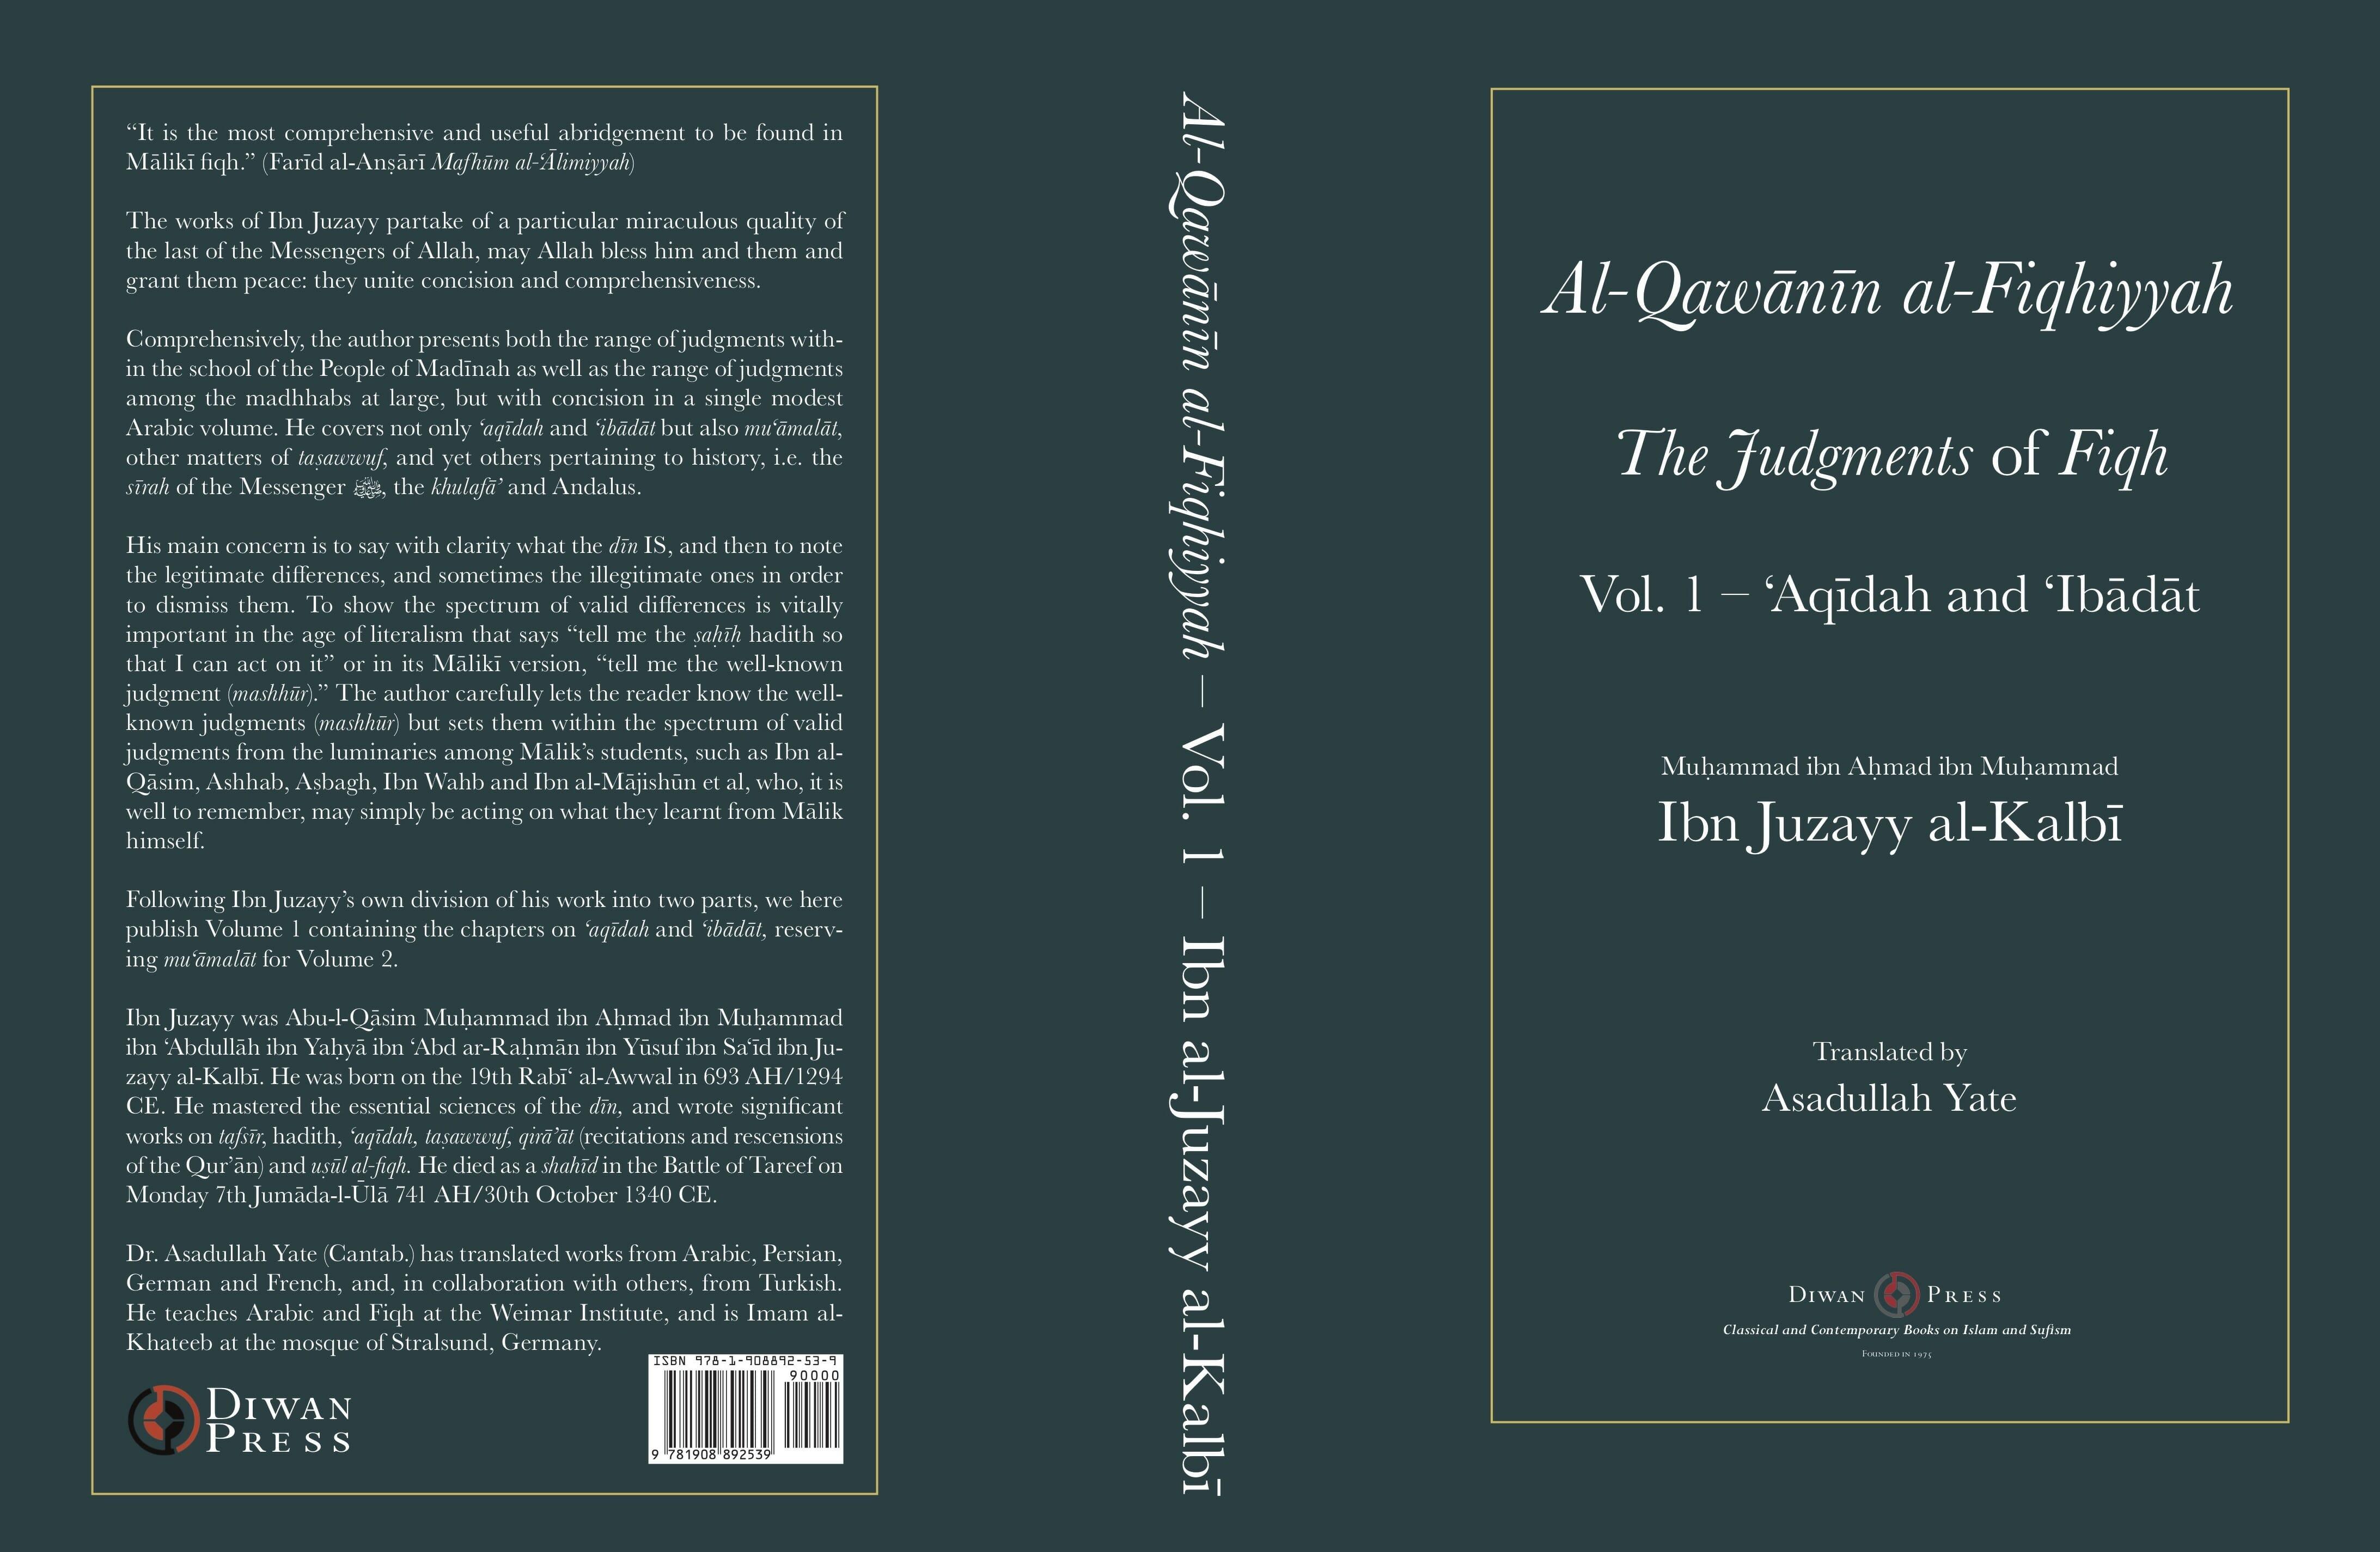 Al-Qawanin al-Fiqhiyyah – The Judgements of Fiqh – Vol 1 on 'Aqīdah and  'Ibādāt